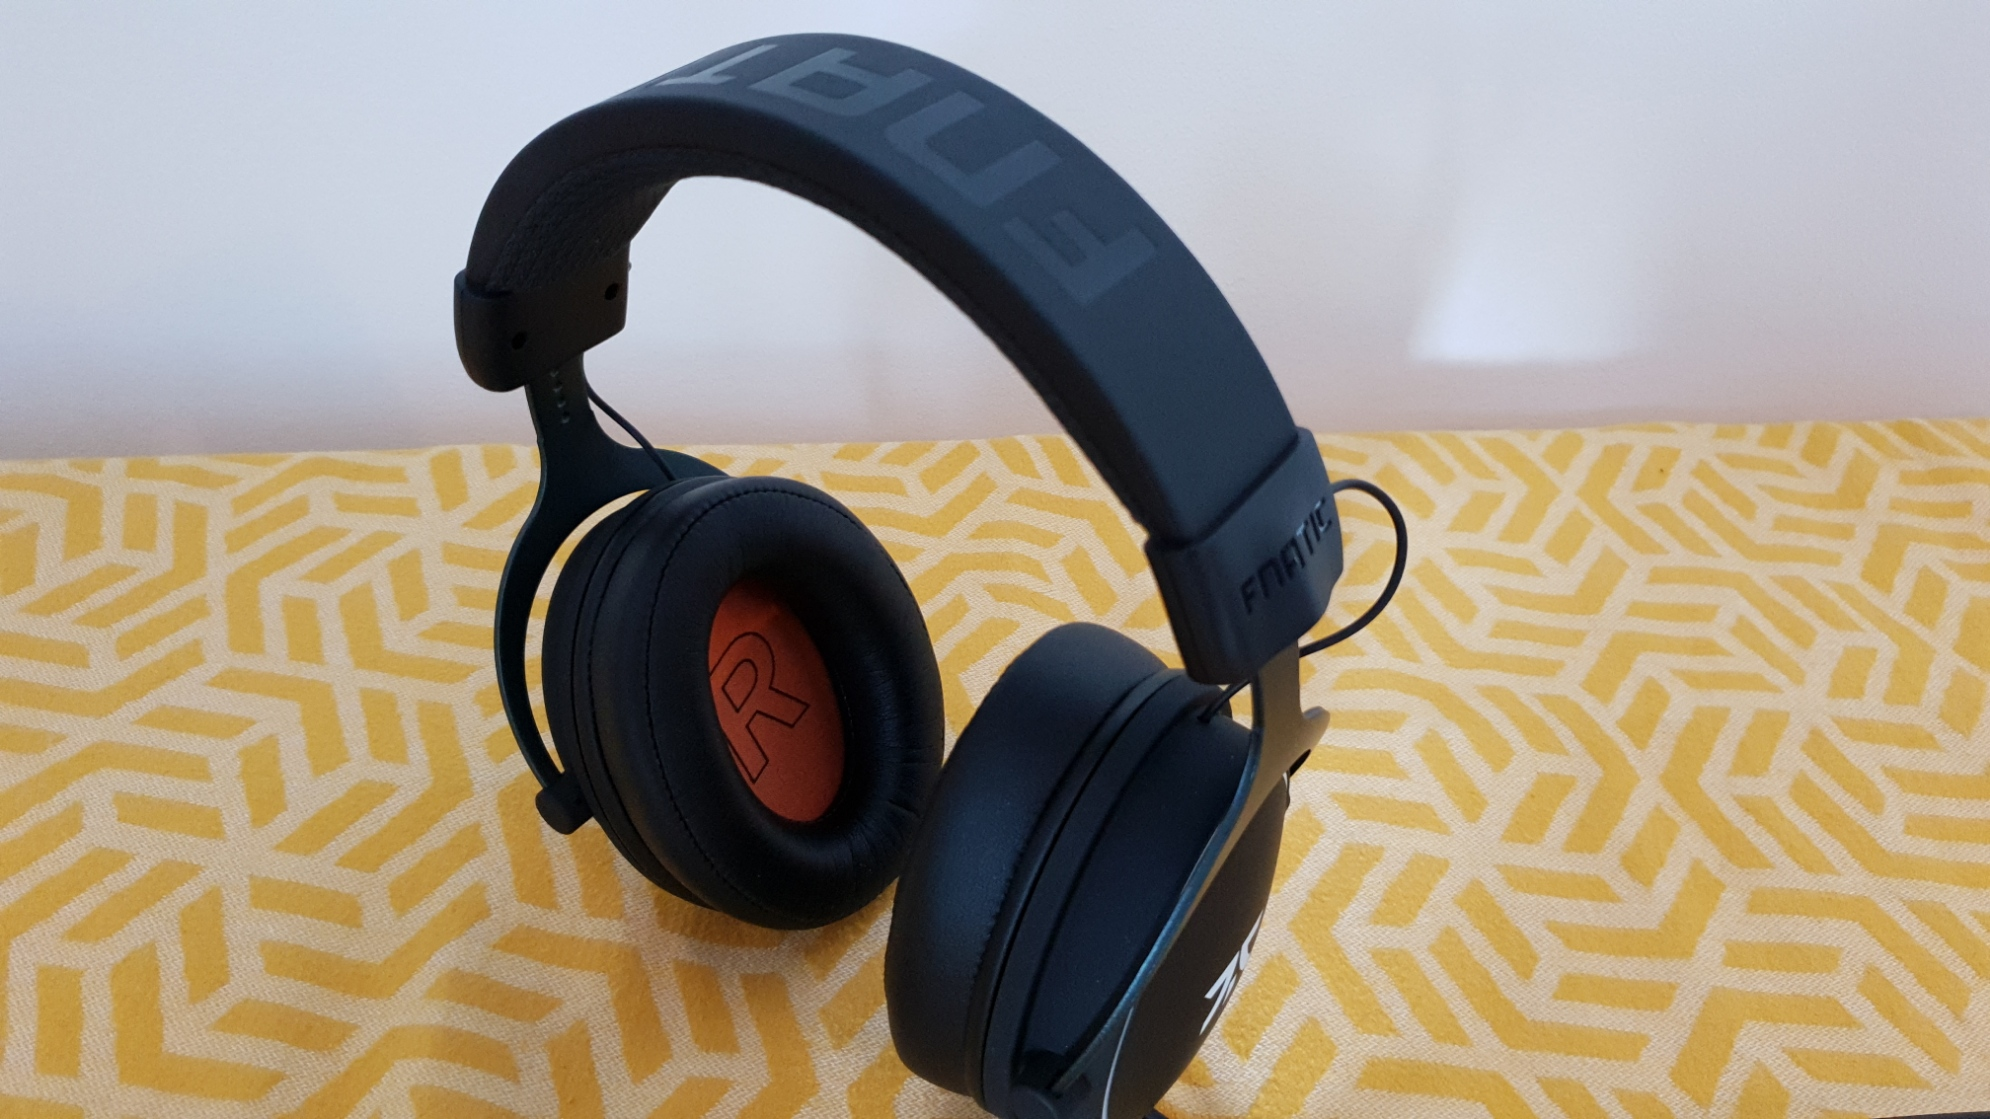 Fnatic React Plus headset